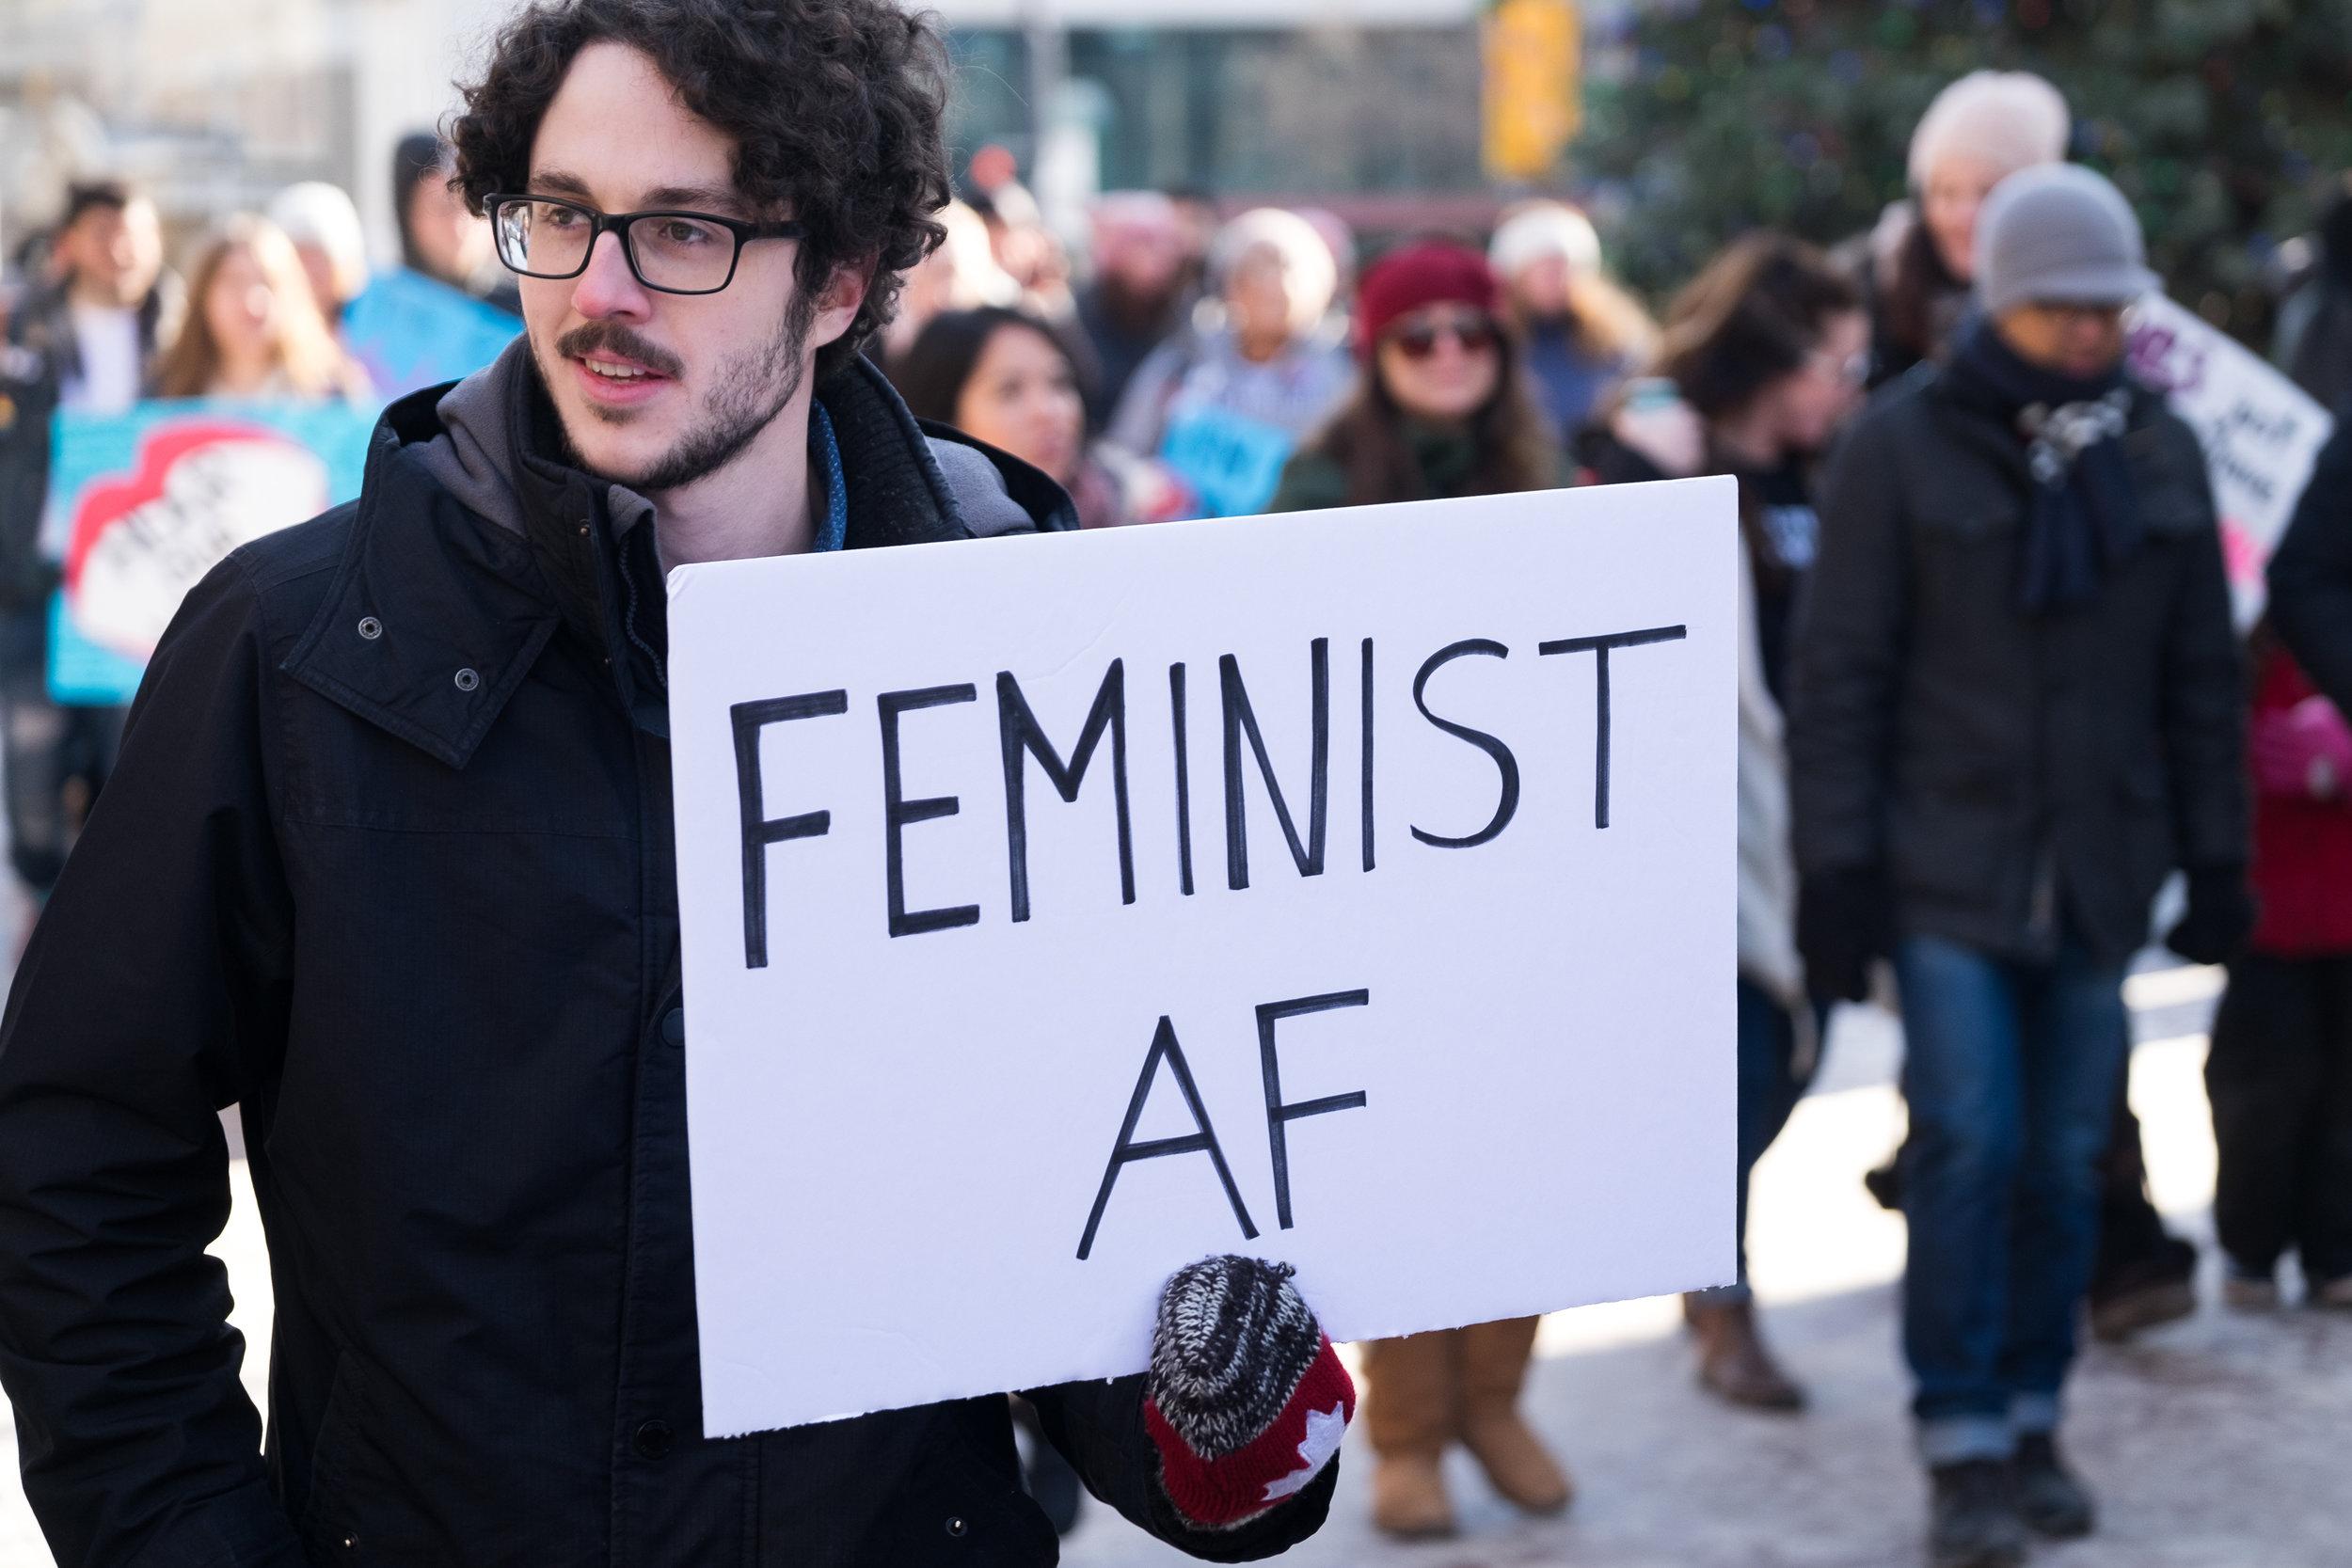 WomensMarchWinnipeg2018_Crump_0761.jpg